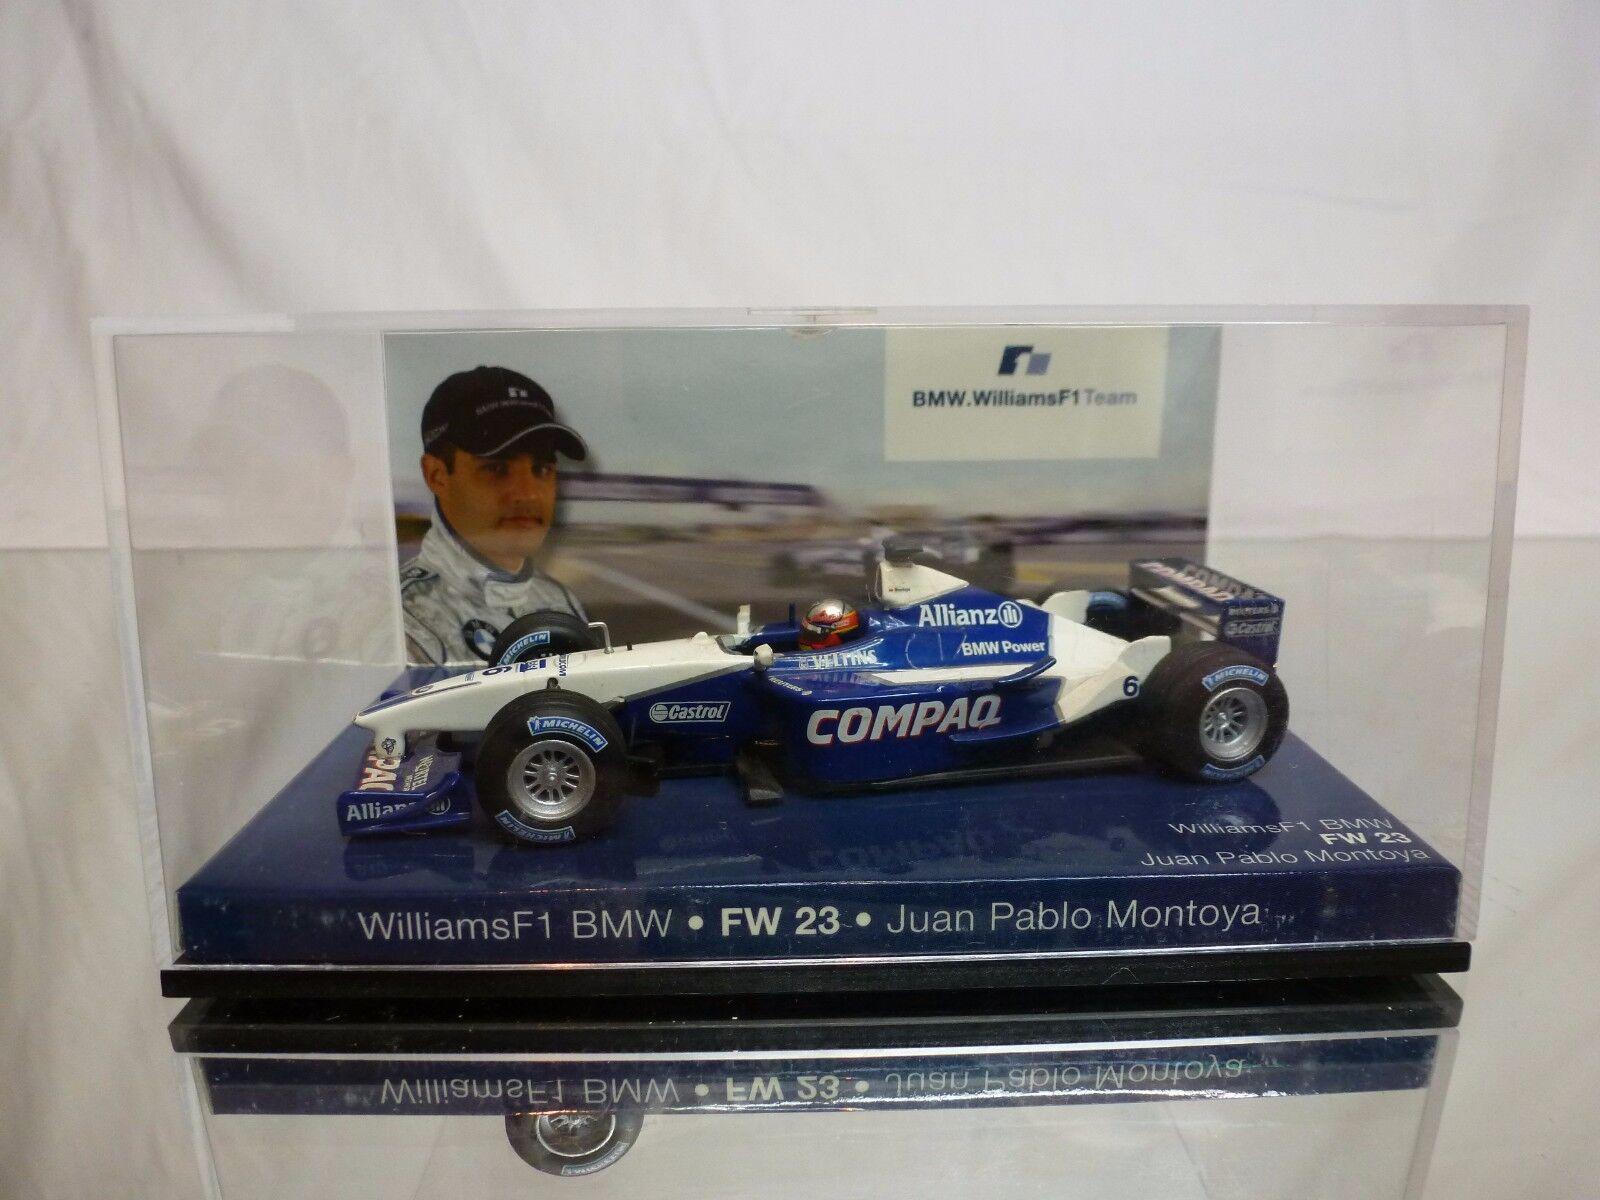 MINICHAMPS MINICHAMPS MINICHAMPS WILLIAMS FW23 BMW - COMPAQ No 6 - MONTOYA - F1 1 43 - GOOD IN BOX 4dfeed